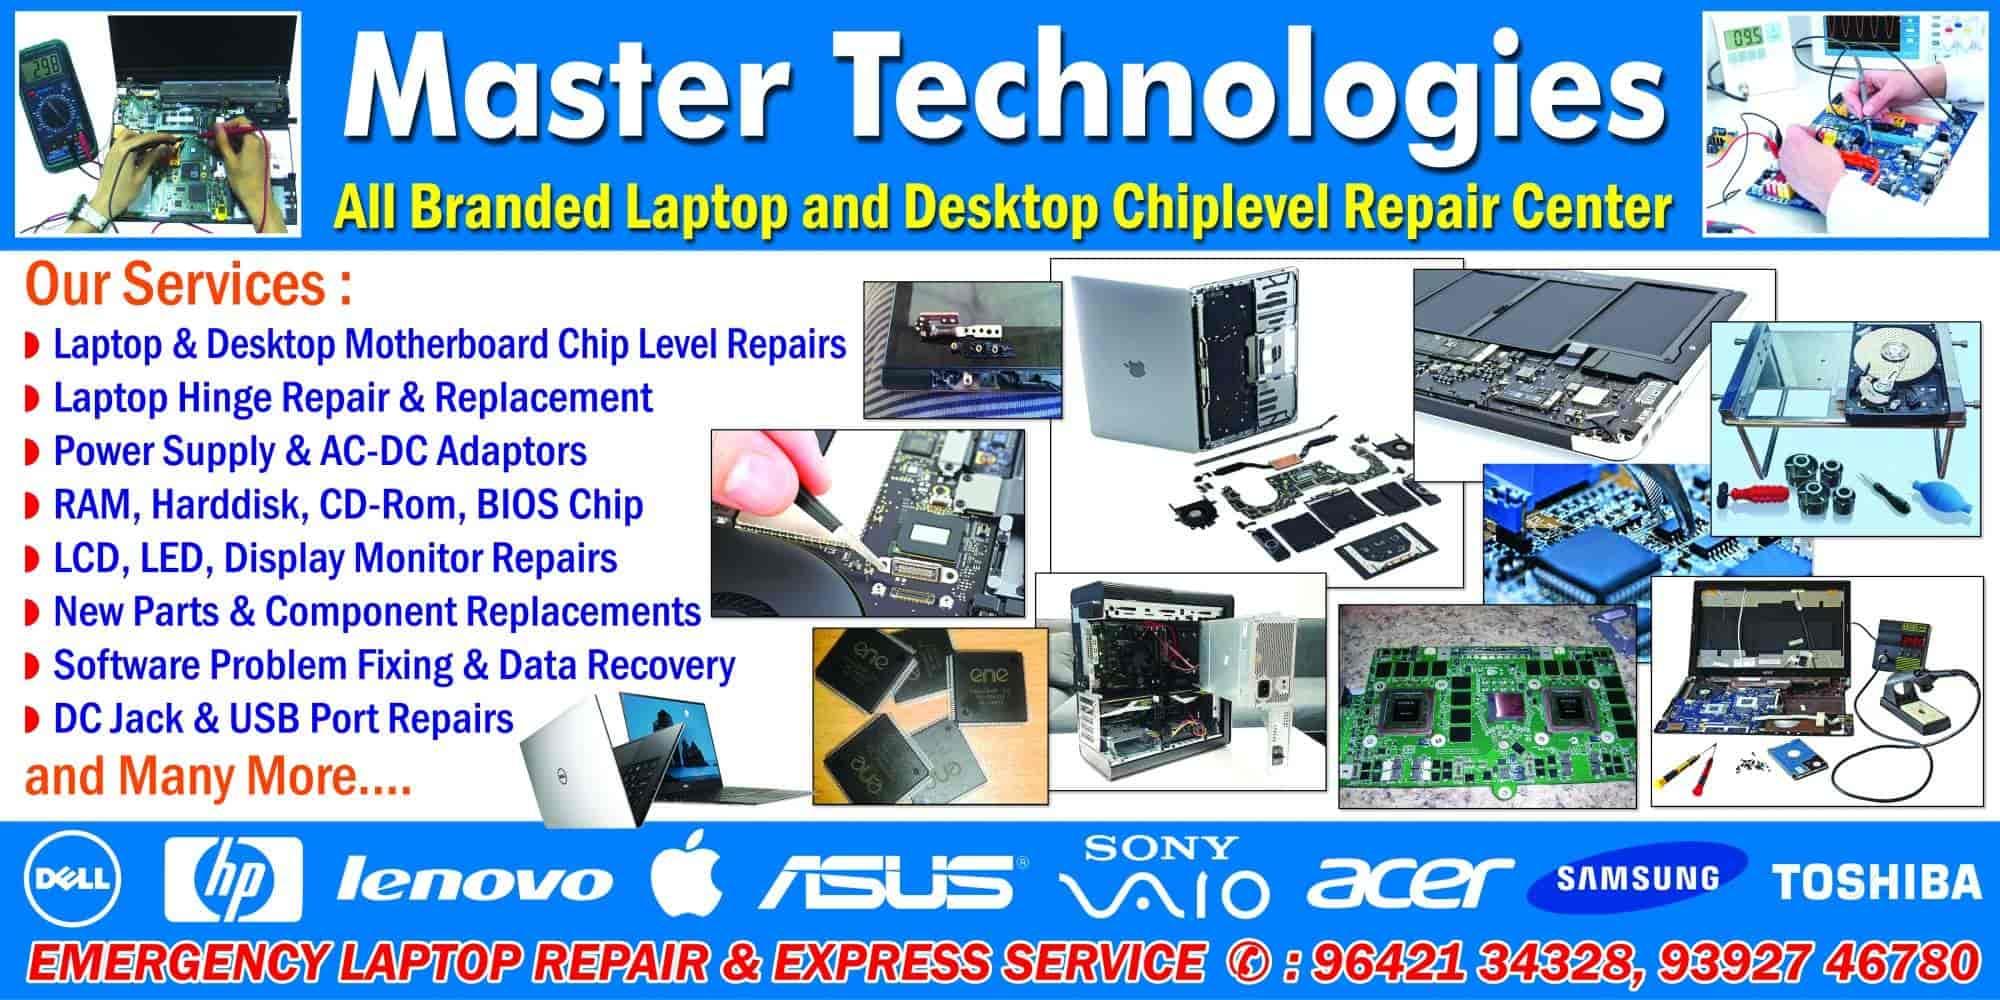 Master Technologies, Labbipet - Computer Chip Level Repair & Services in  Vijayawada - Justdial